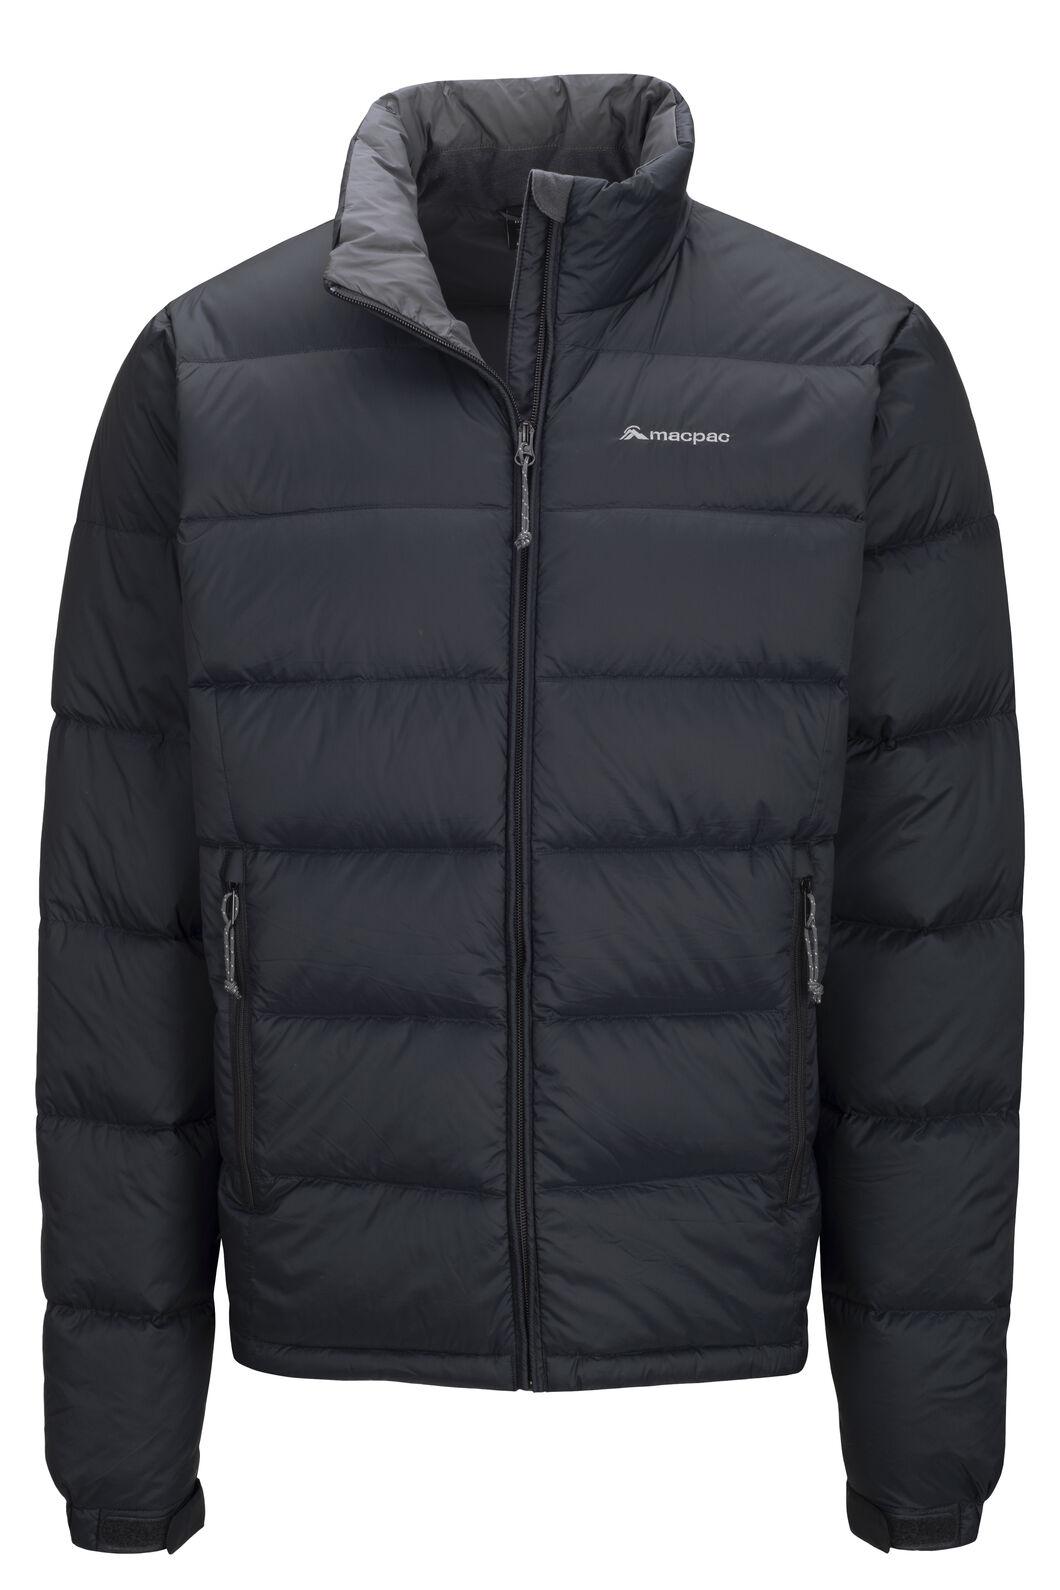 Macpac Men's Halo Down Jacket, Black, hi-res